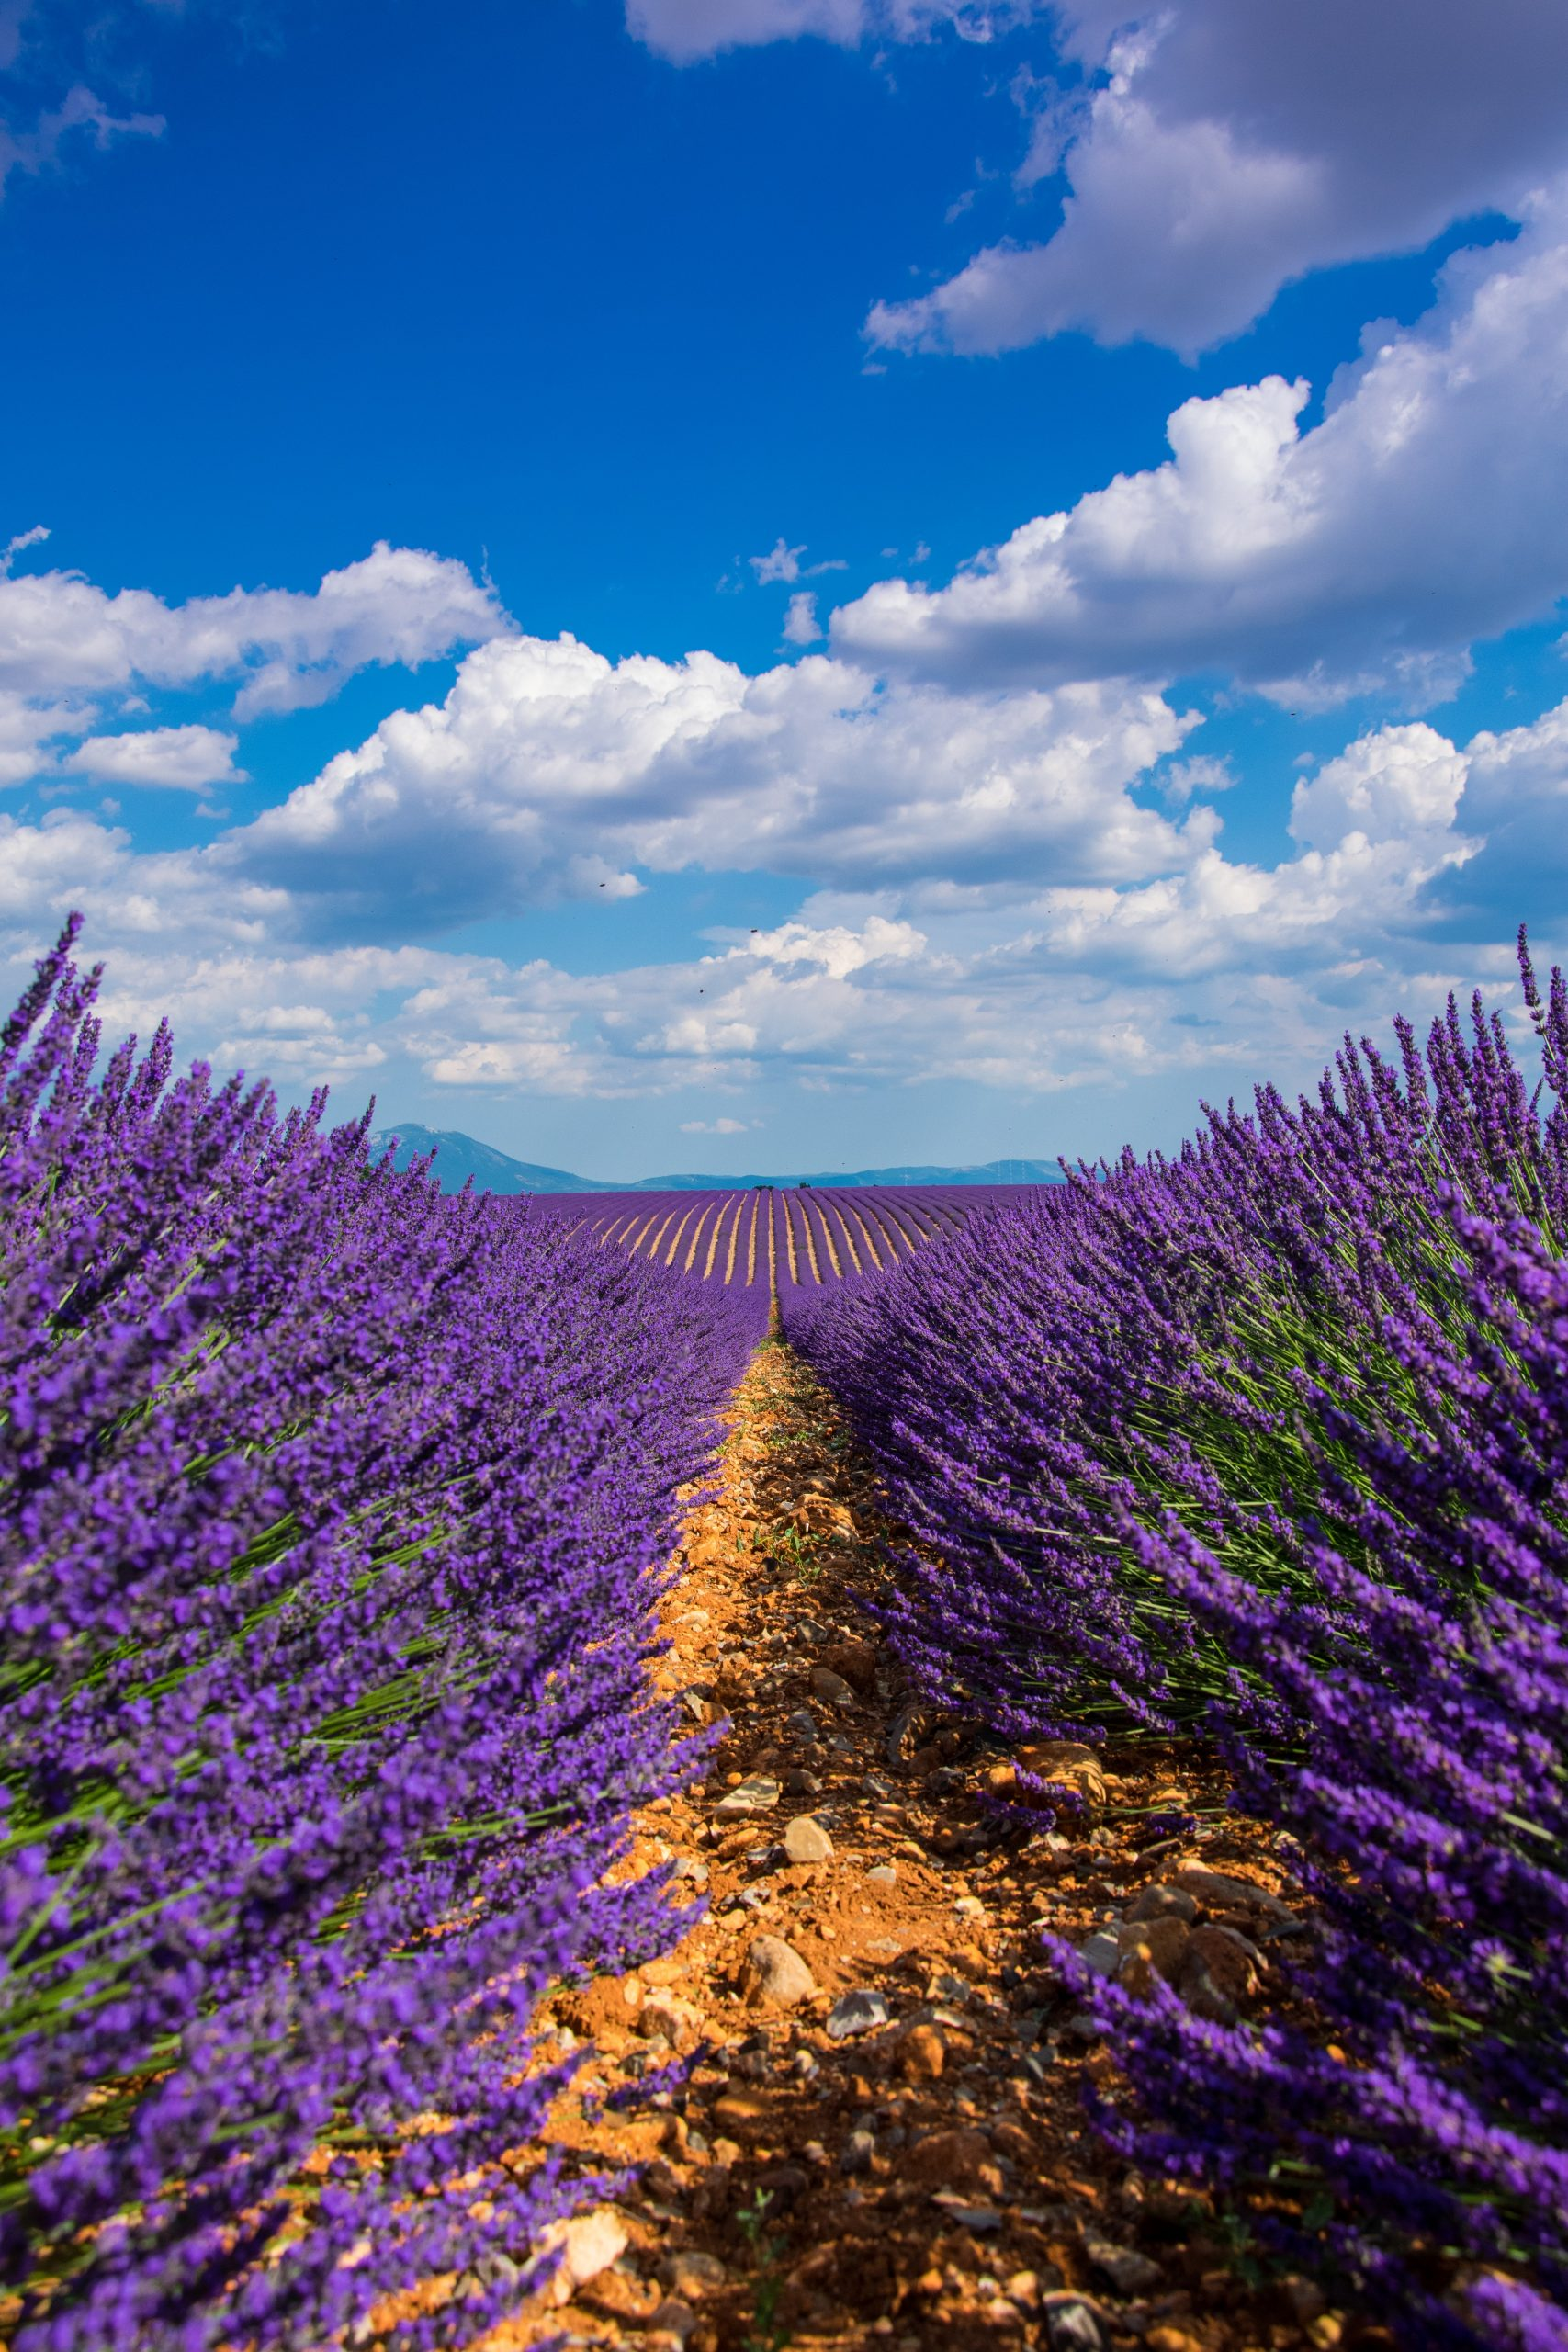 Floviva Lavender Hydrolat